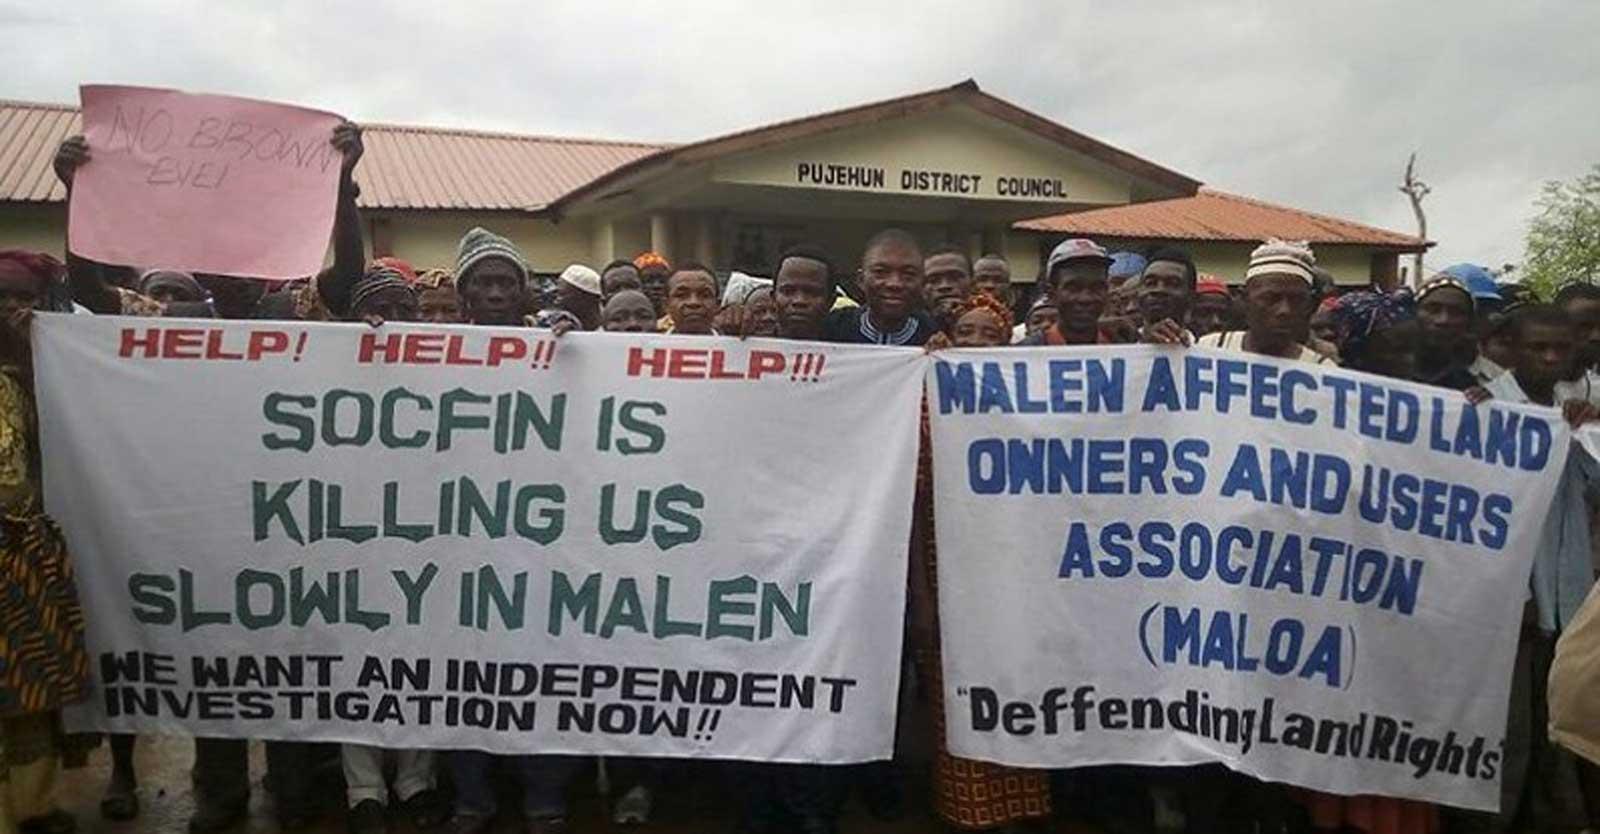 Protest against SOCFIN in Pujehun District, Malen Chiefdom, Sierra Leone.